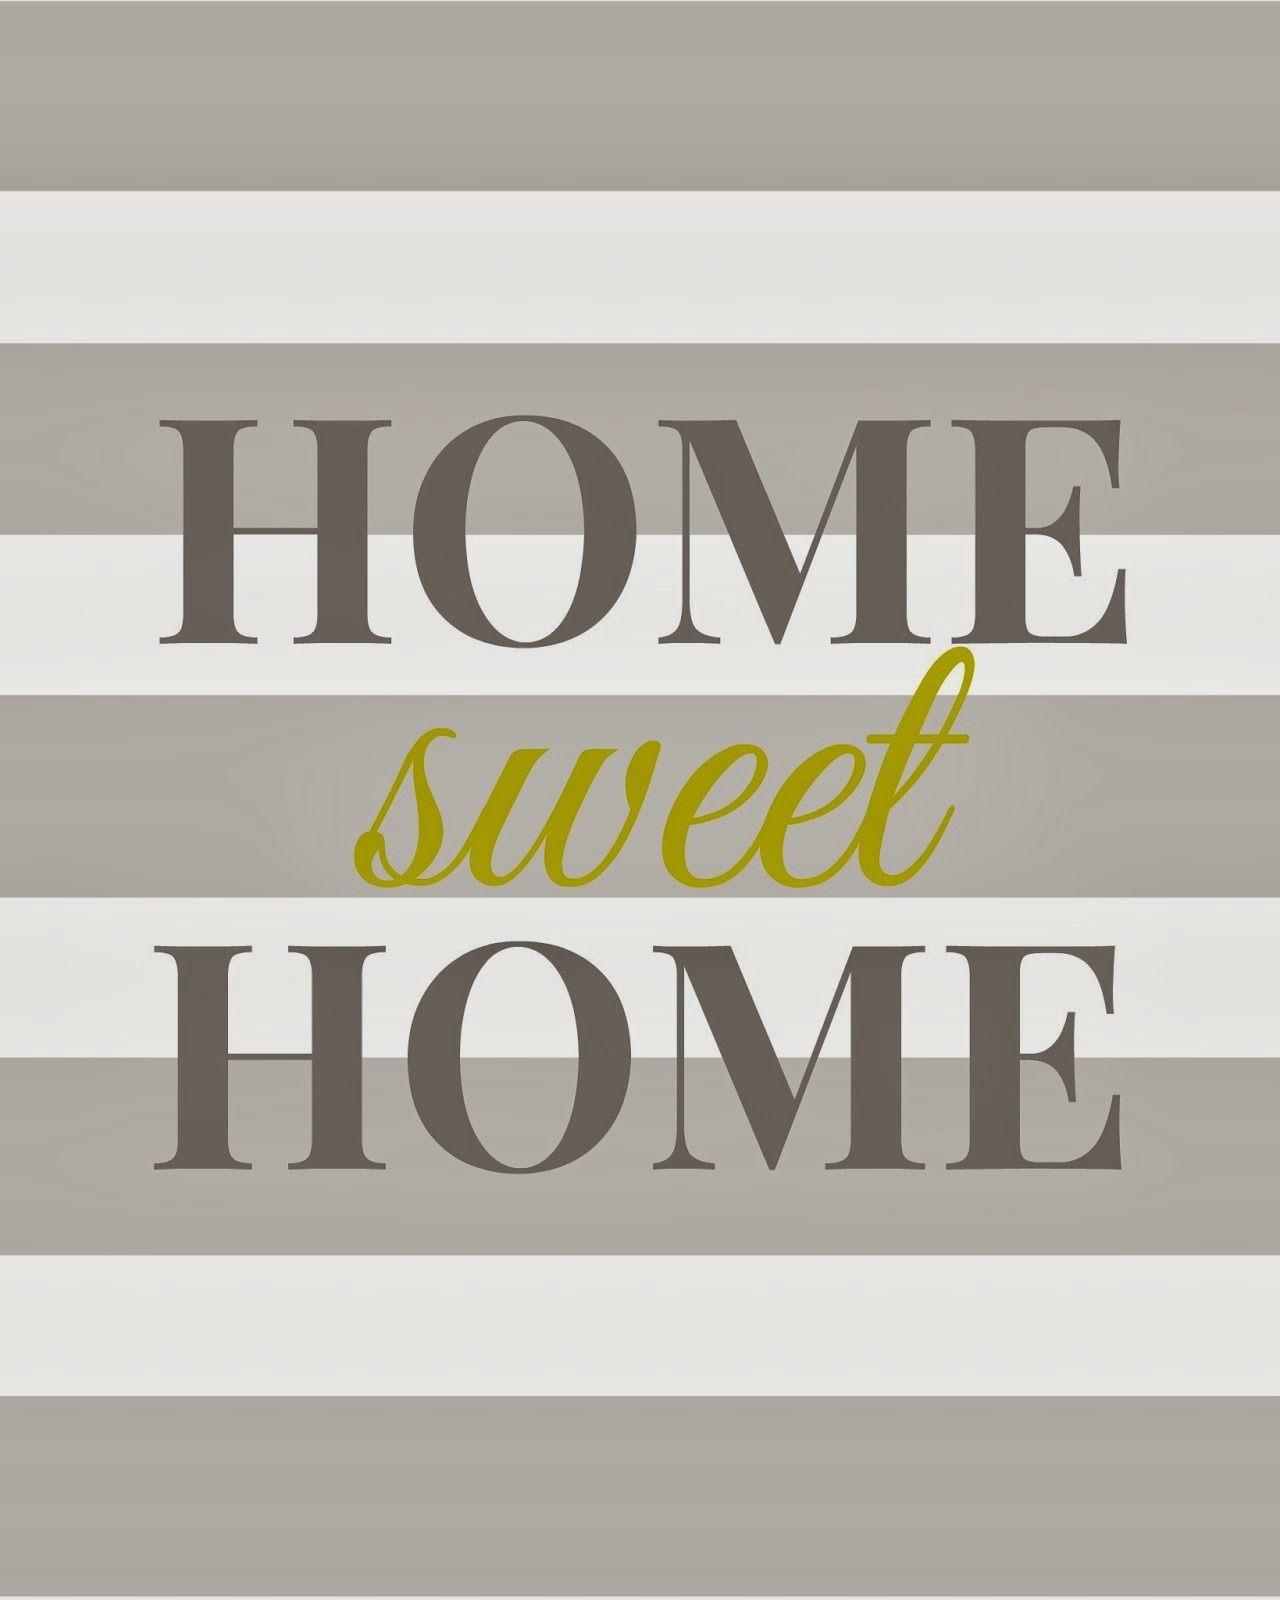 Home Sweet Home - Free Printable | Printables + Fonts | Home Decor - Home Sweet Home Free Printable